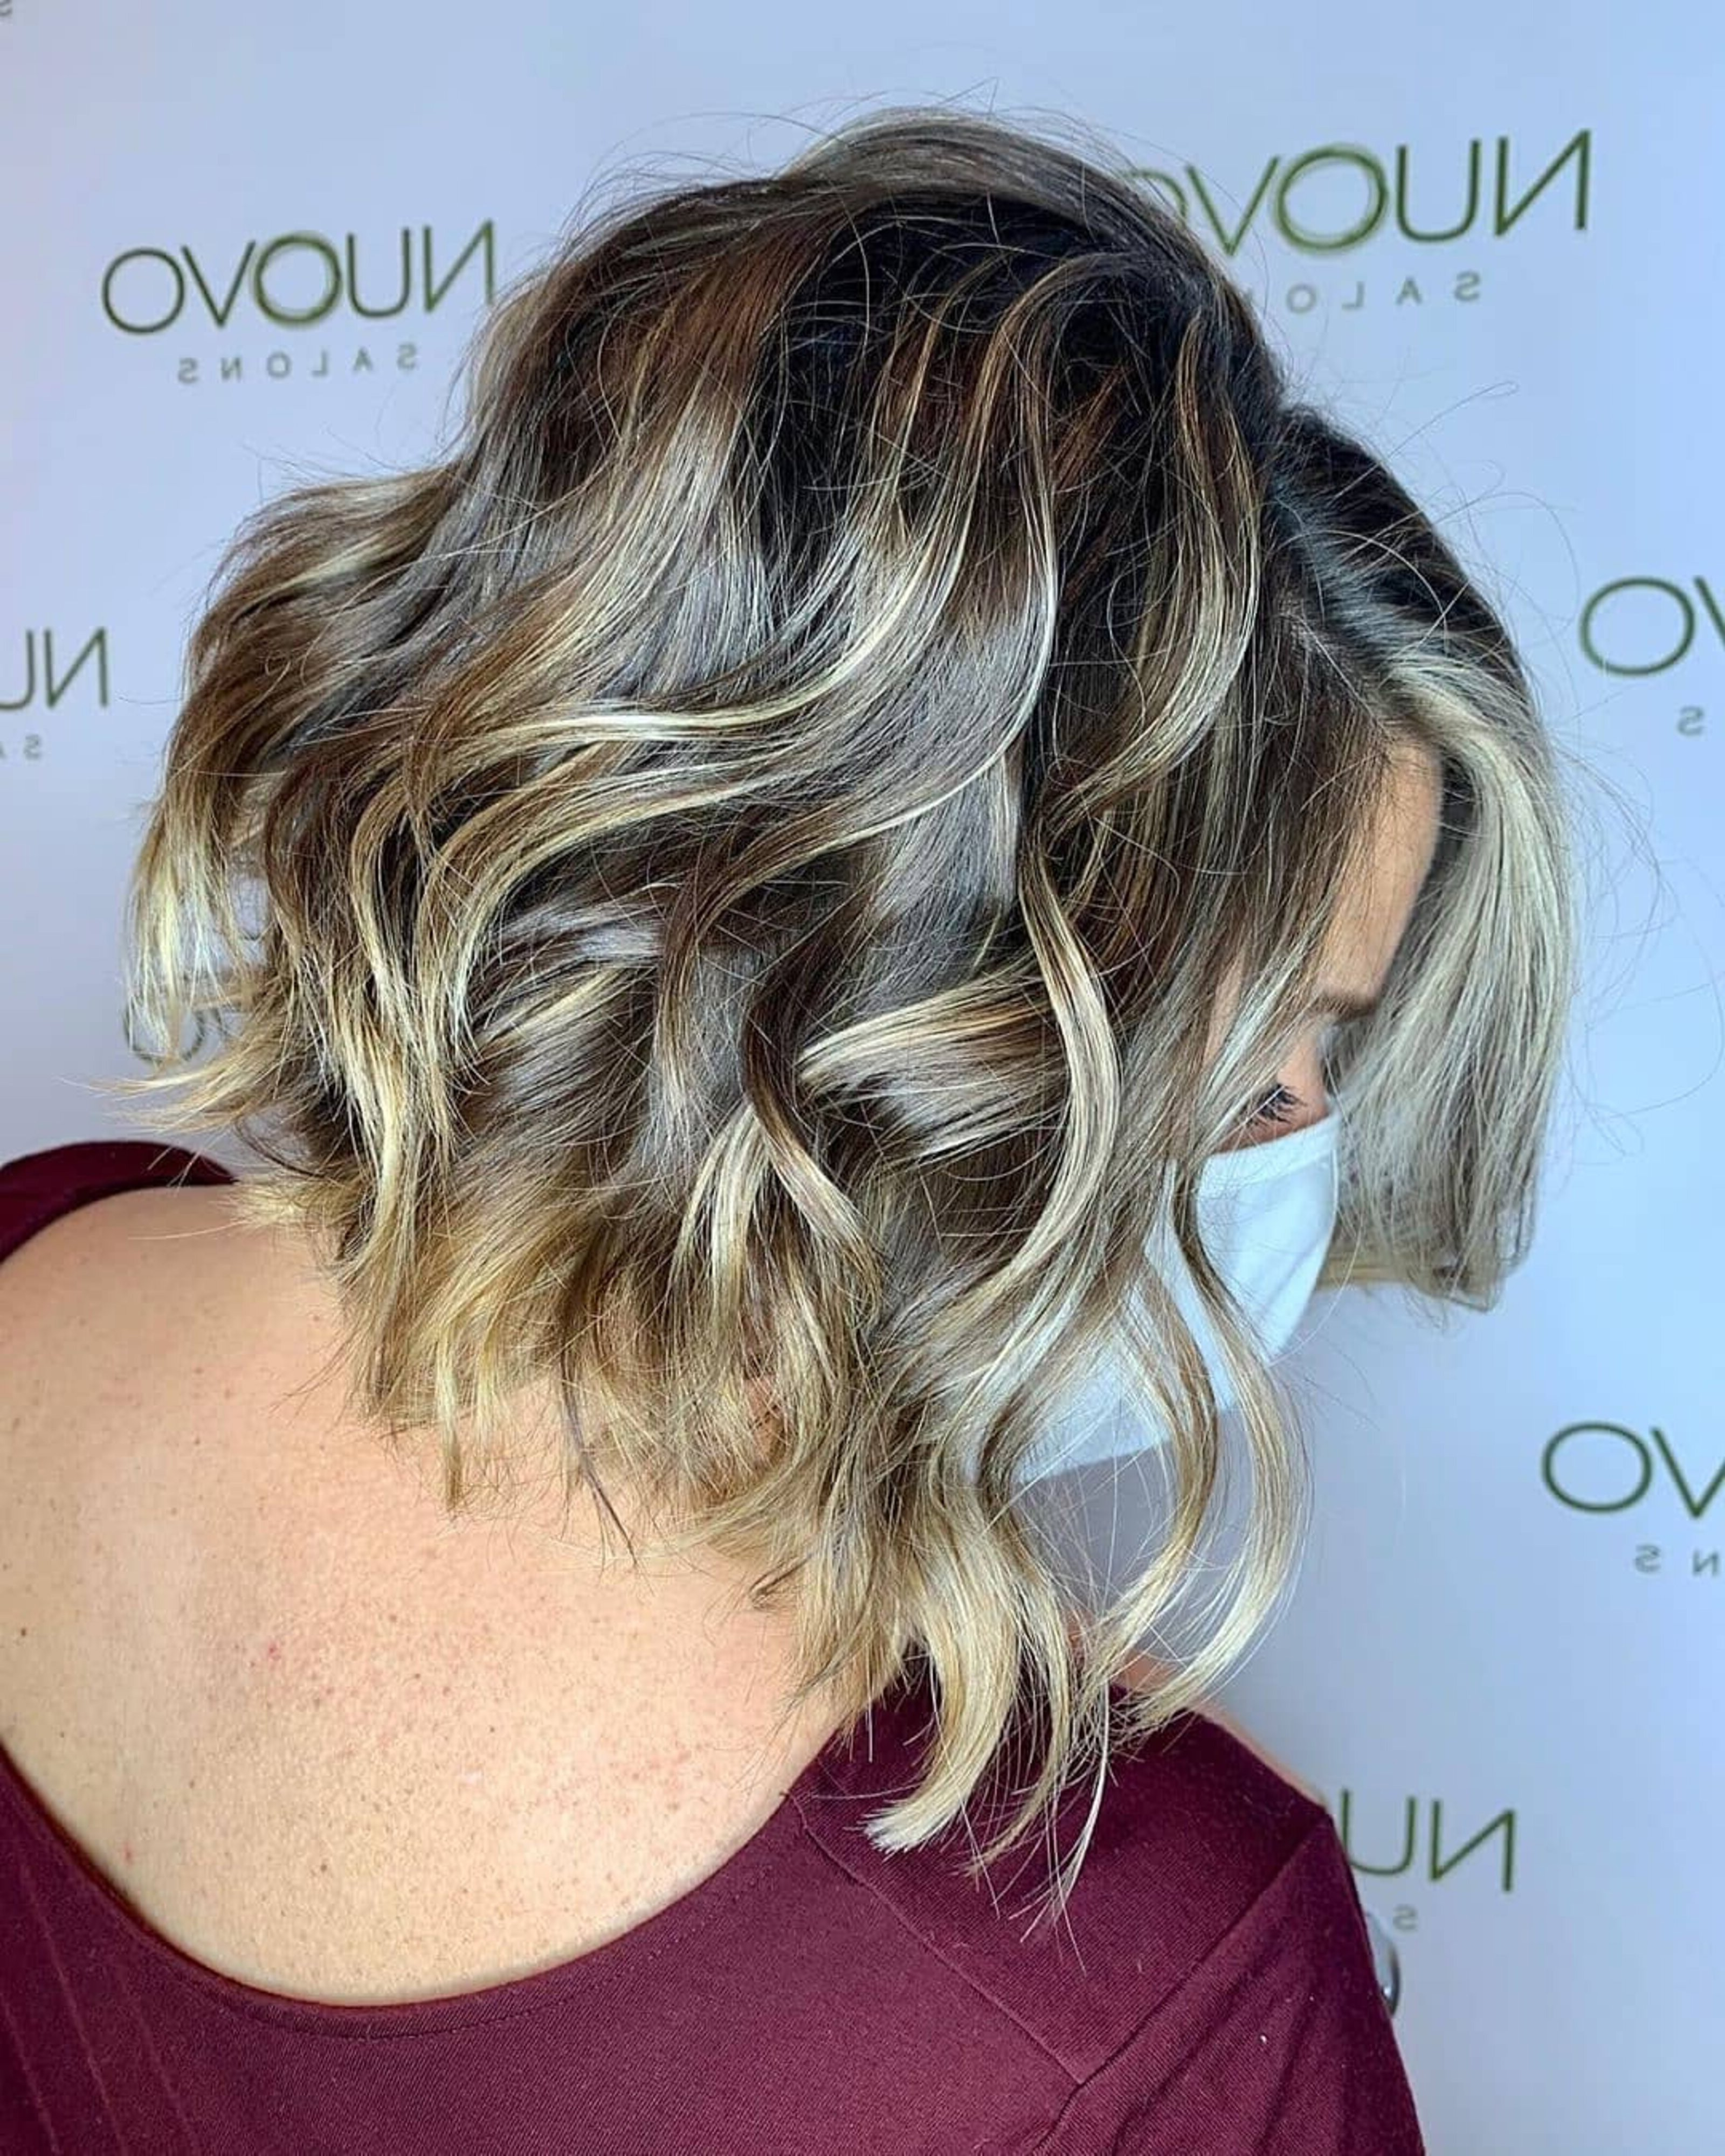 A shaggy bob haircut with impressive highlights.